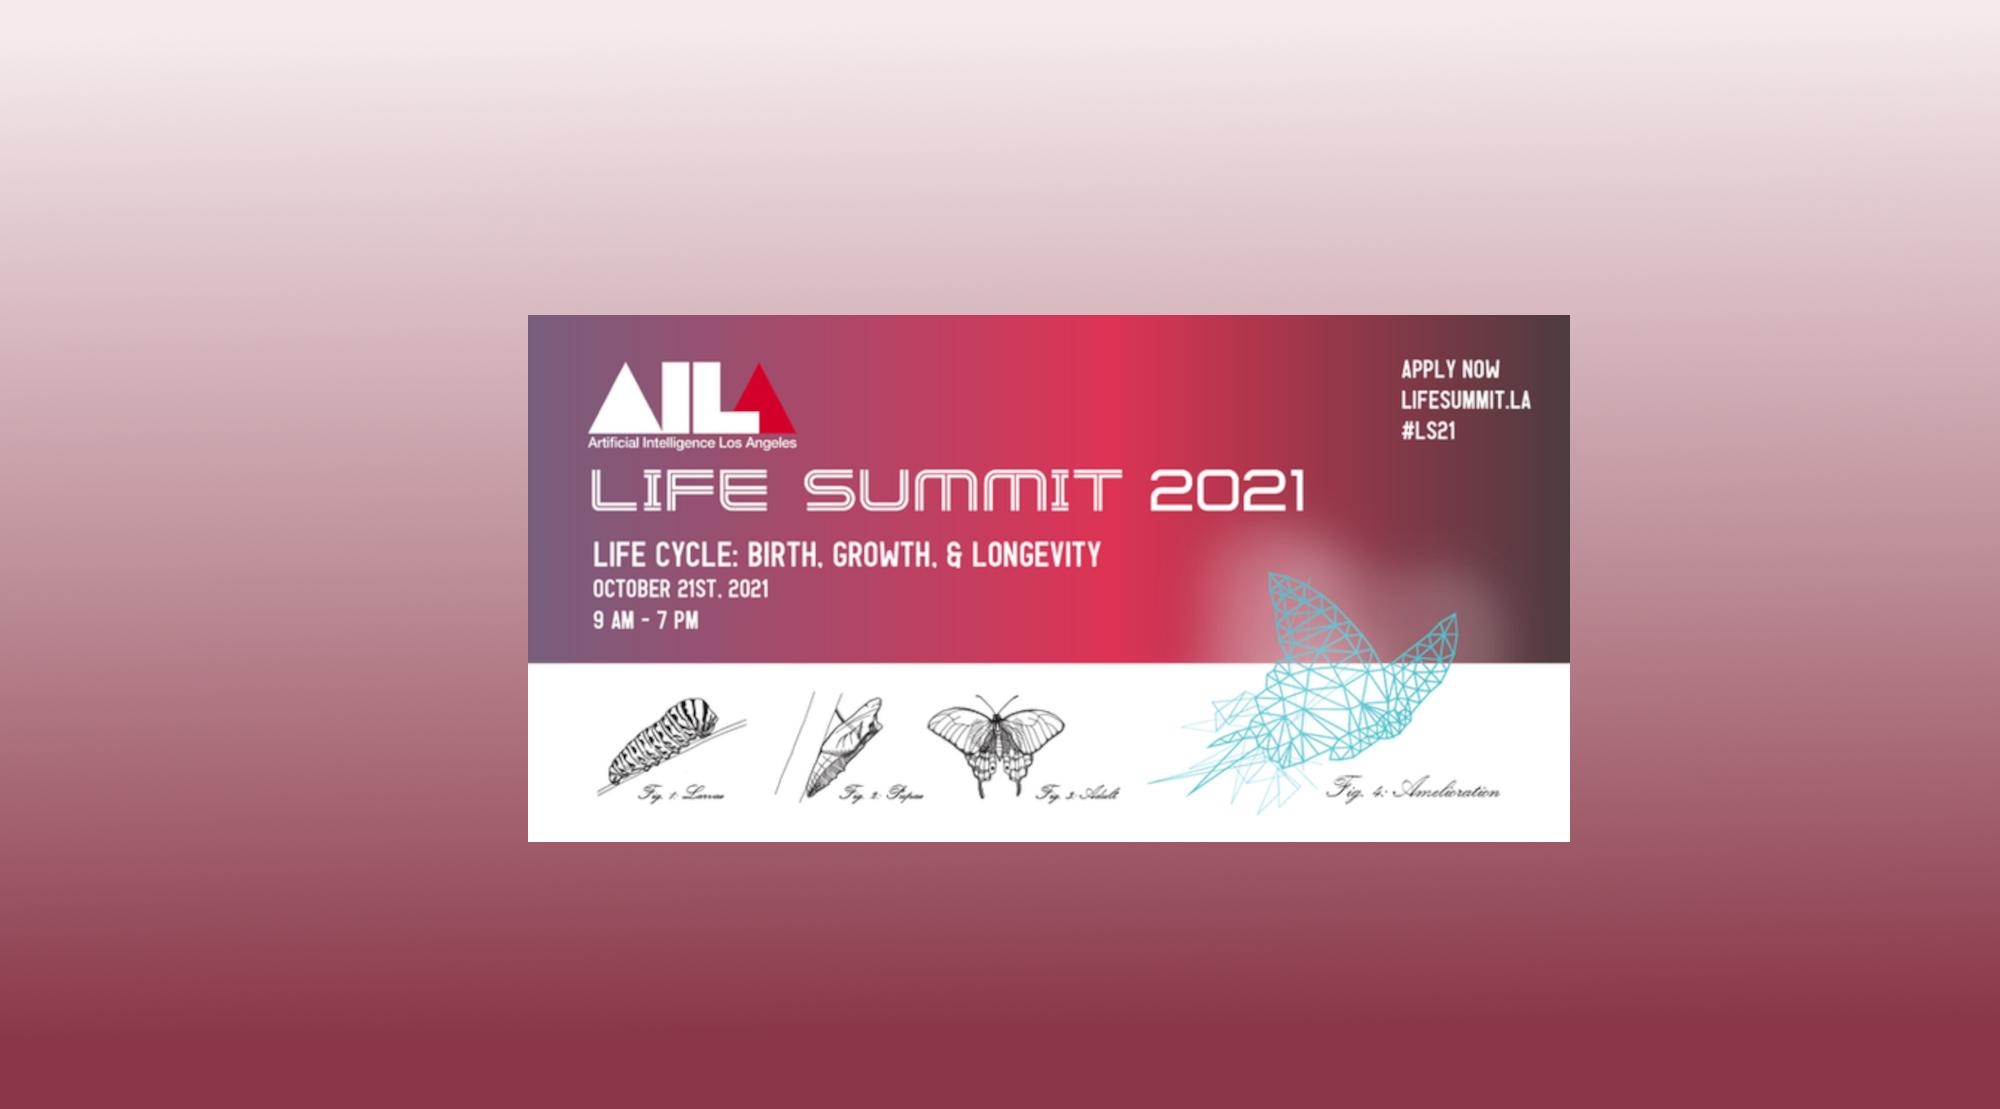 AI LA Life Summit 2021